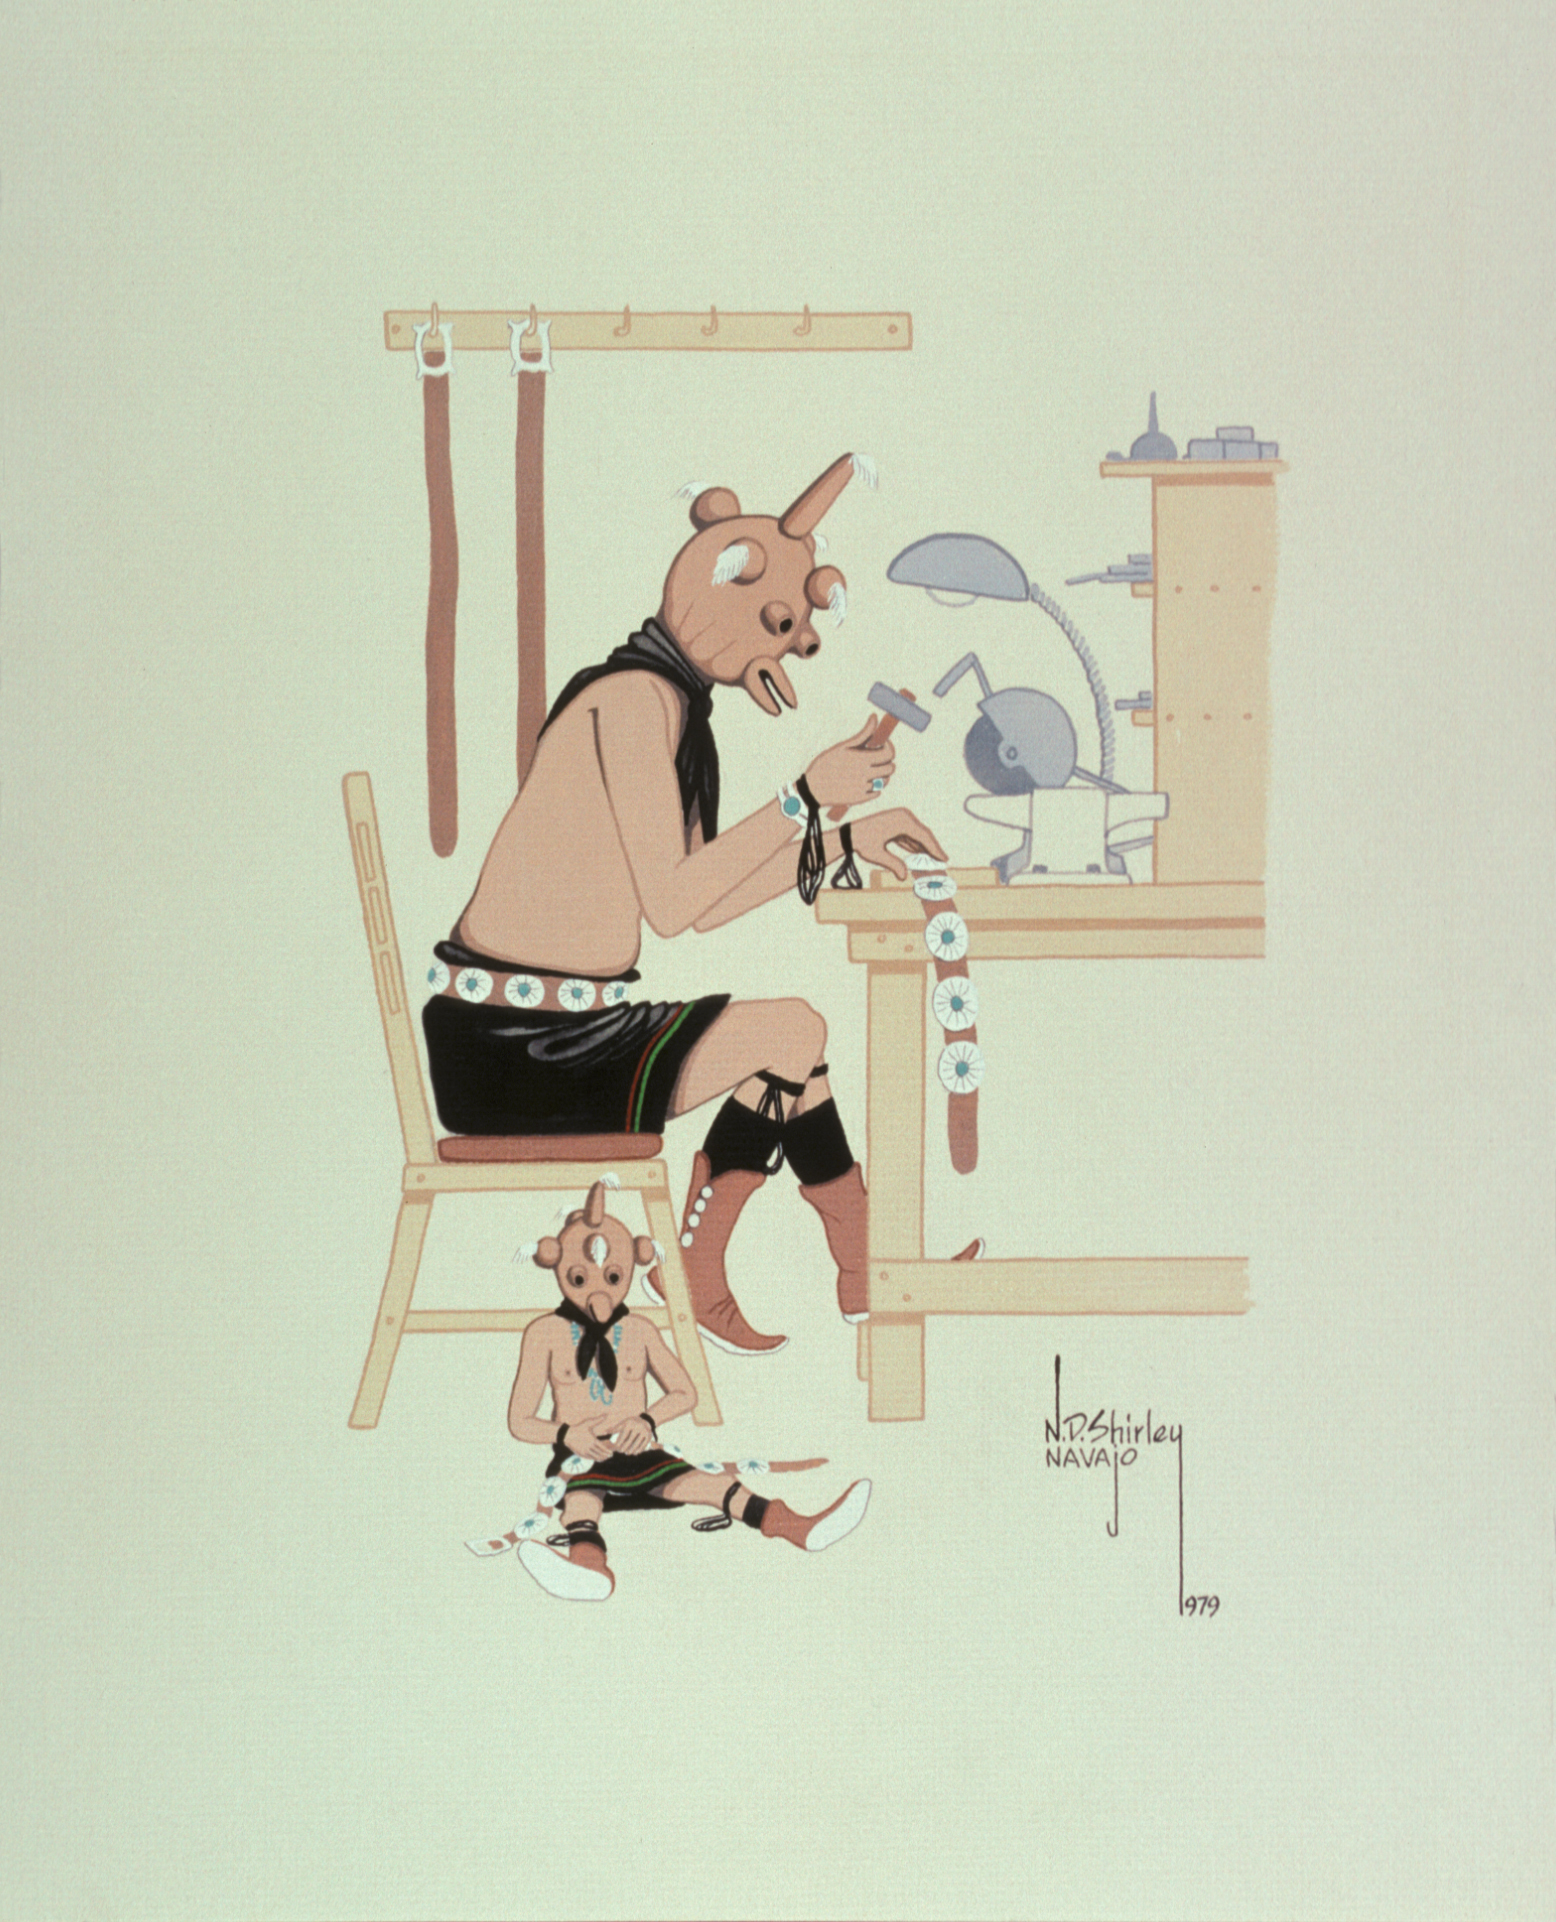 Mudhead Belt Makers (1979) -by- Nelson D. Shirley (Hashkay-ha-nah) Navajo Watercolor on Board  Catalog No.: 2000-186-198